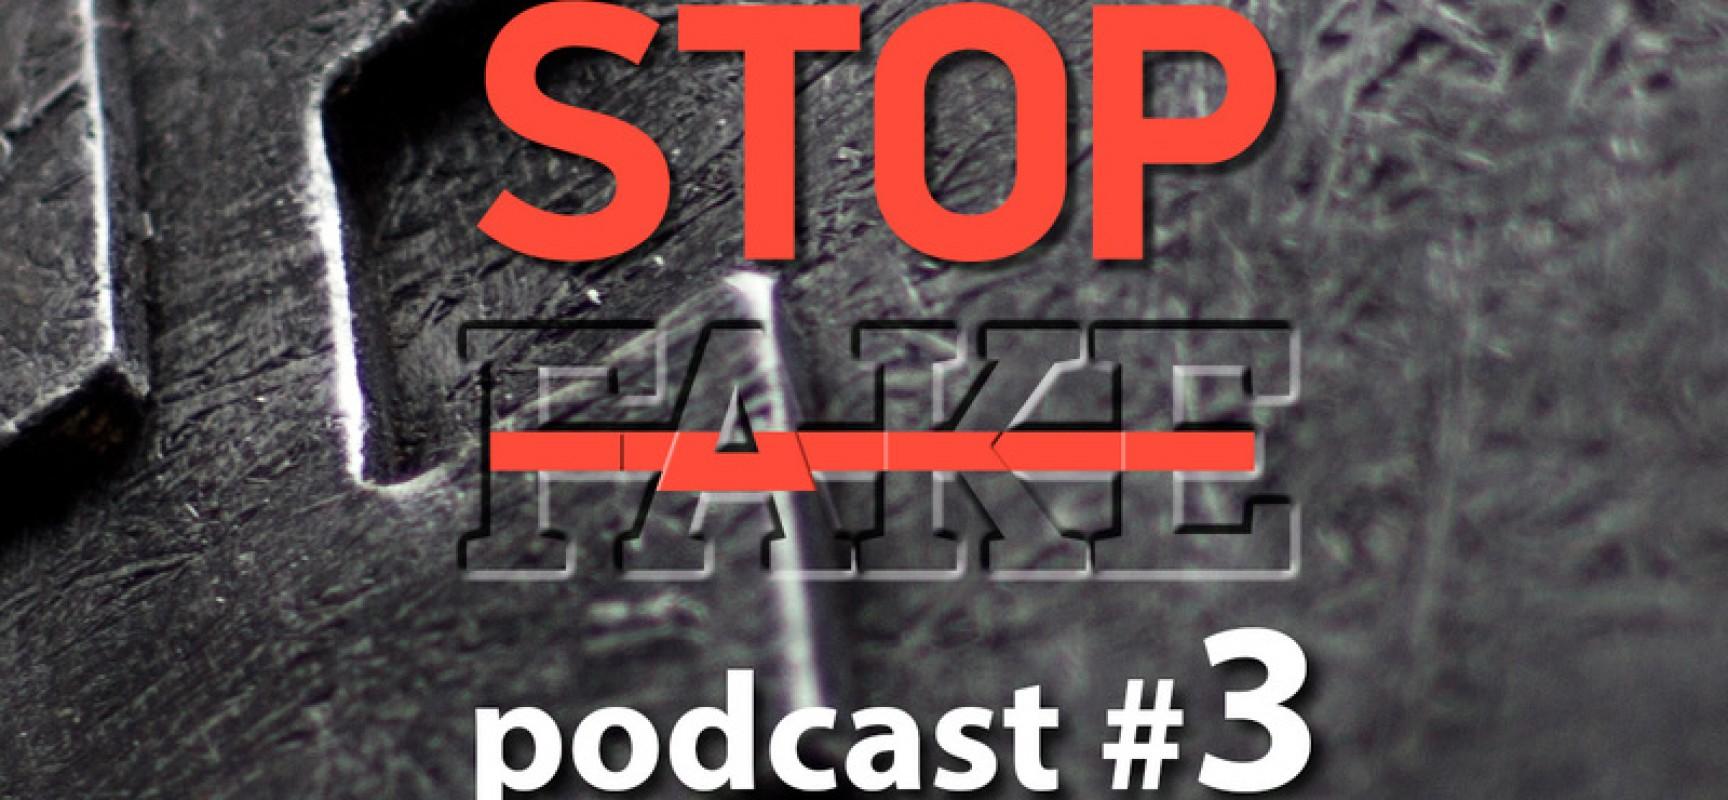 StopFake podcast #3